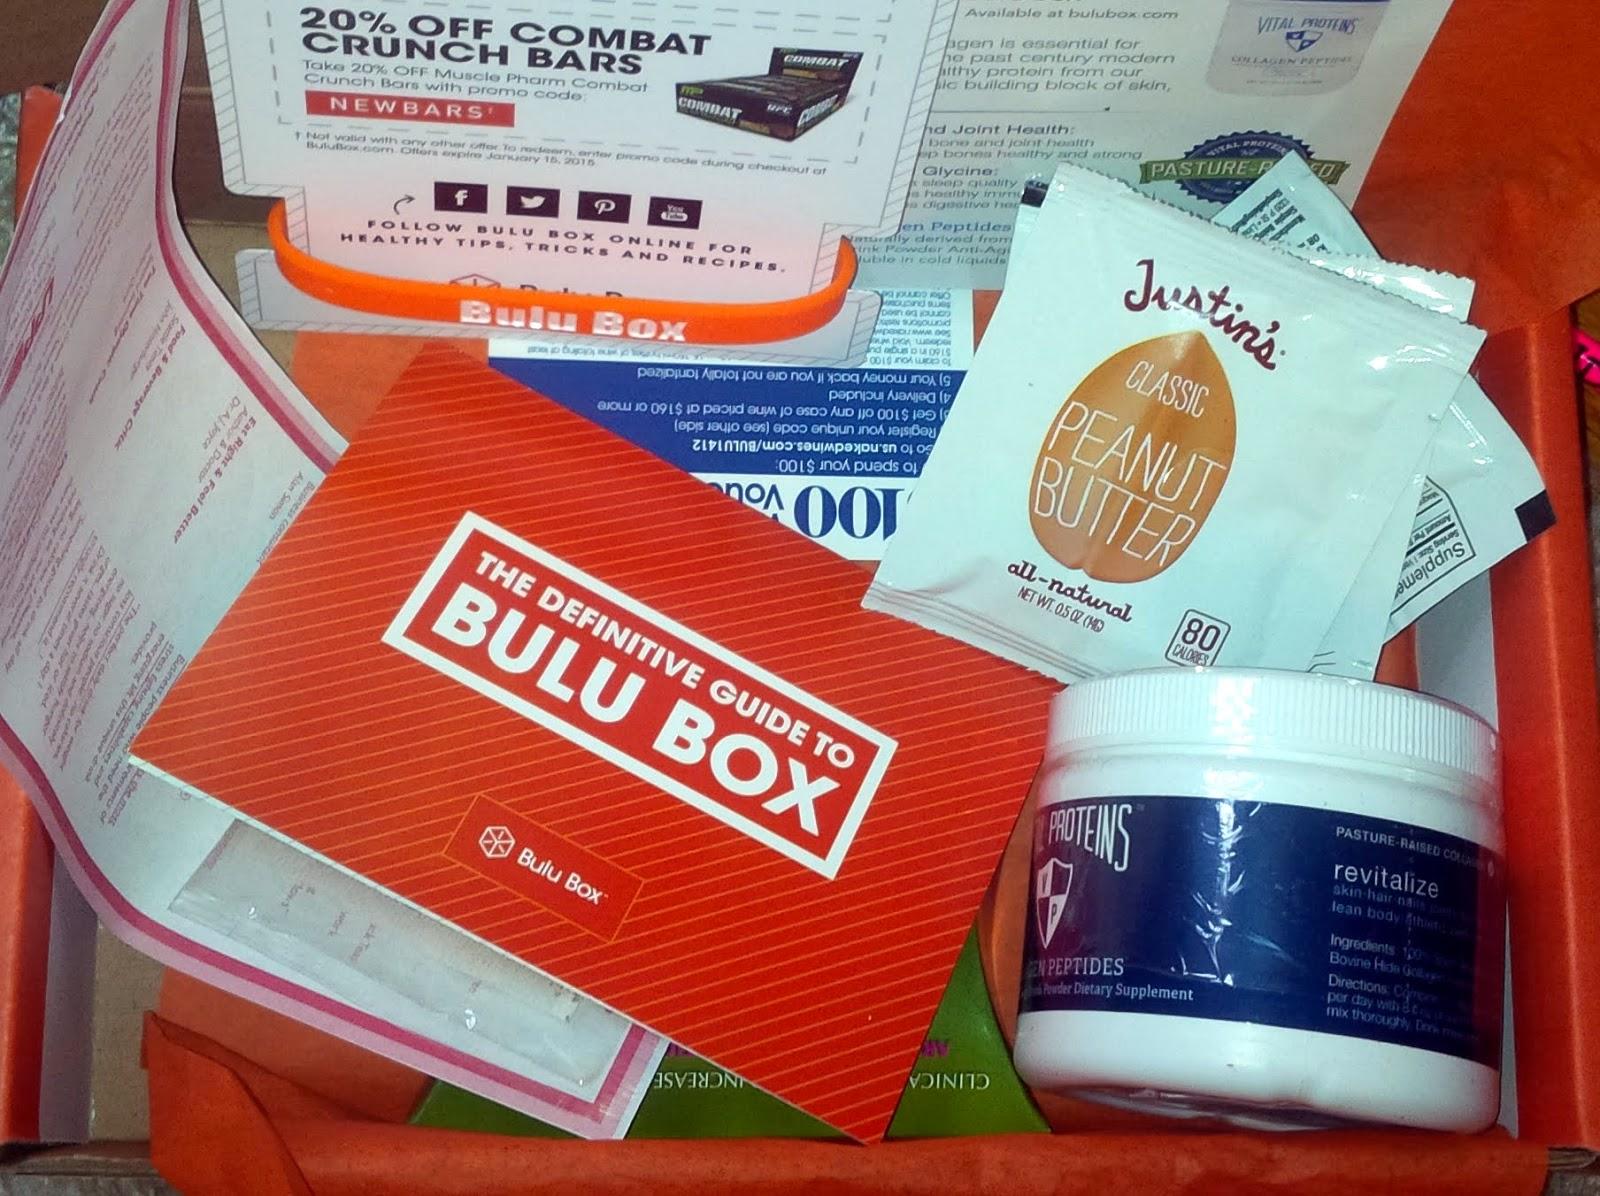 December Bulu Box Review